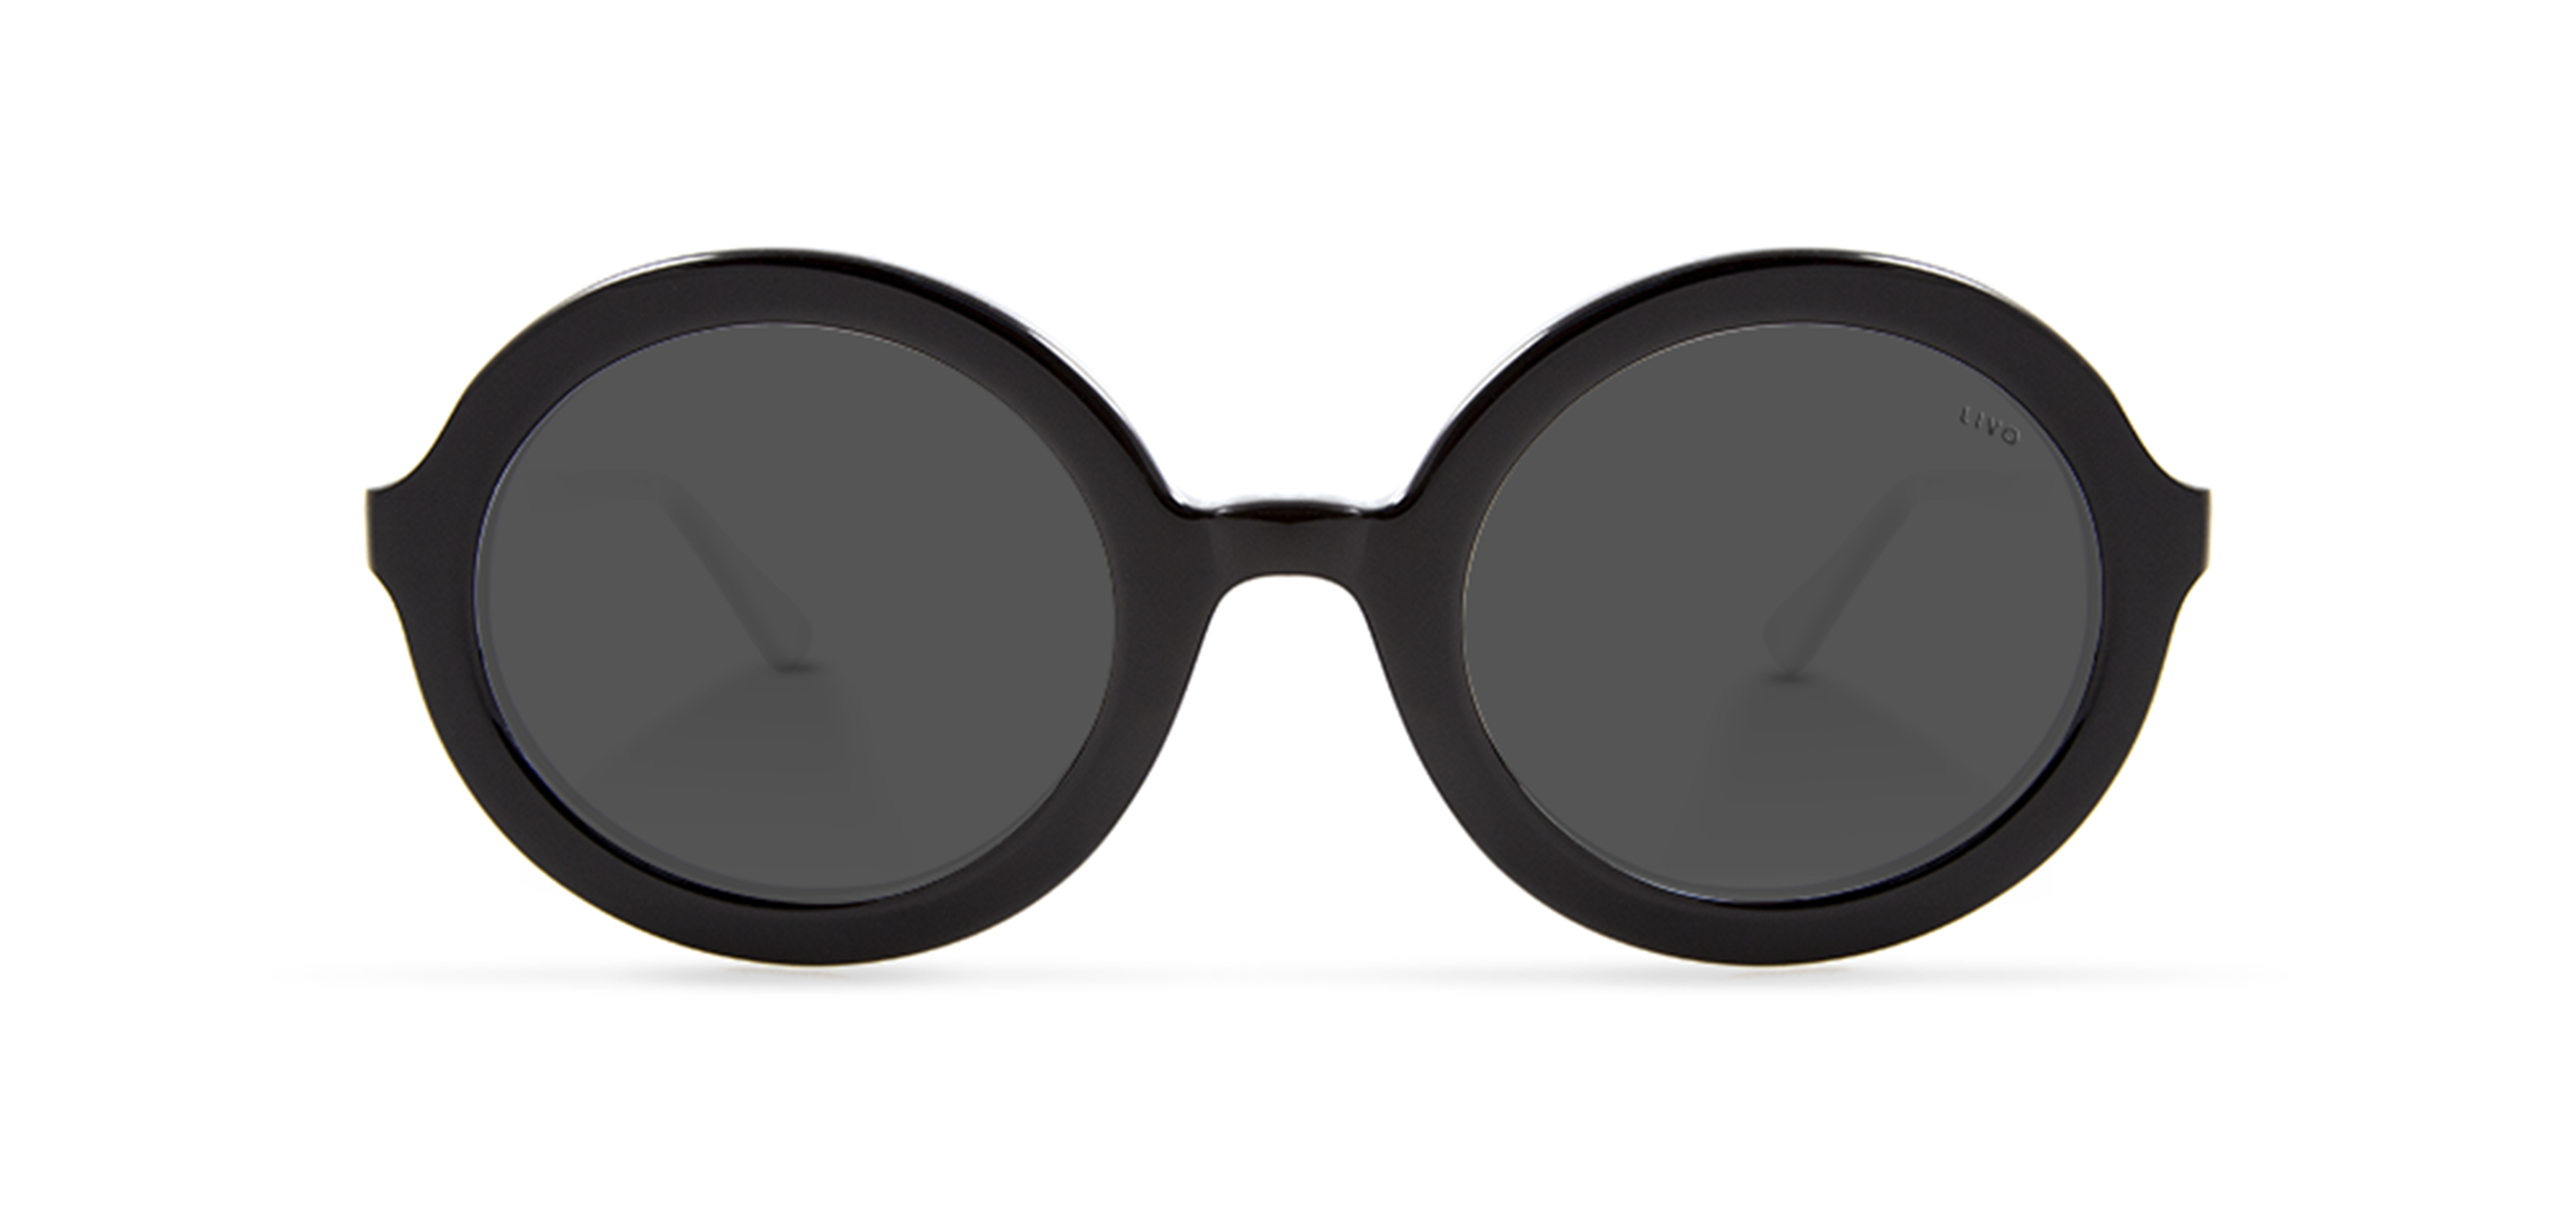 LIVO Eywwear - Rita - R$349,00 (5)